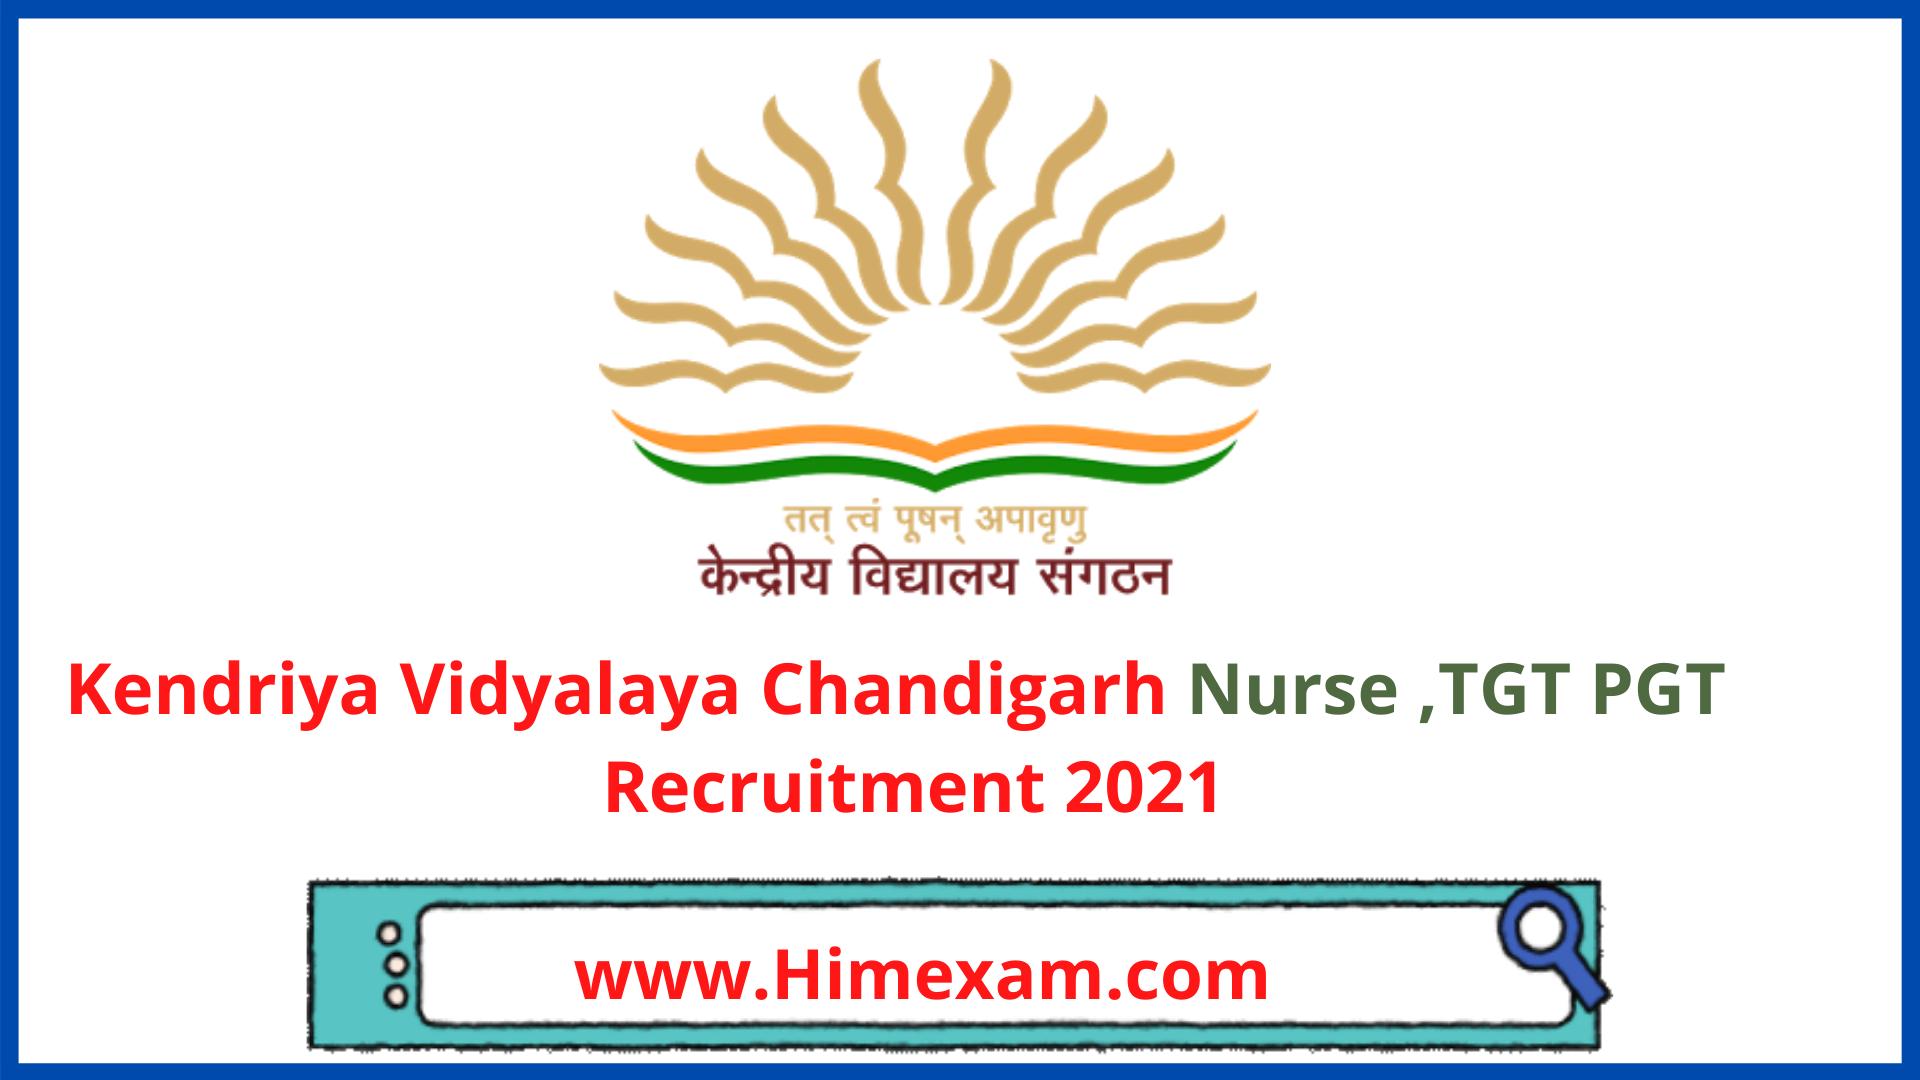 Kendriya Vidyalaya Chandigarh Nurse ,TGT PGT  Recruitment 2021